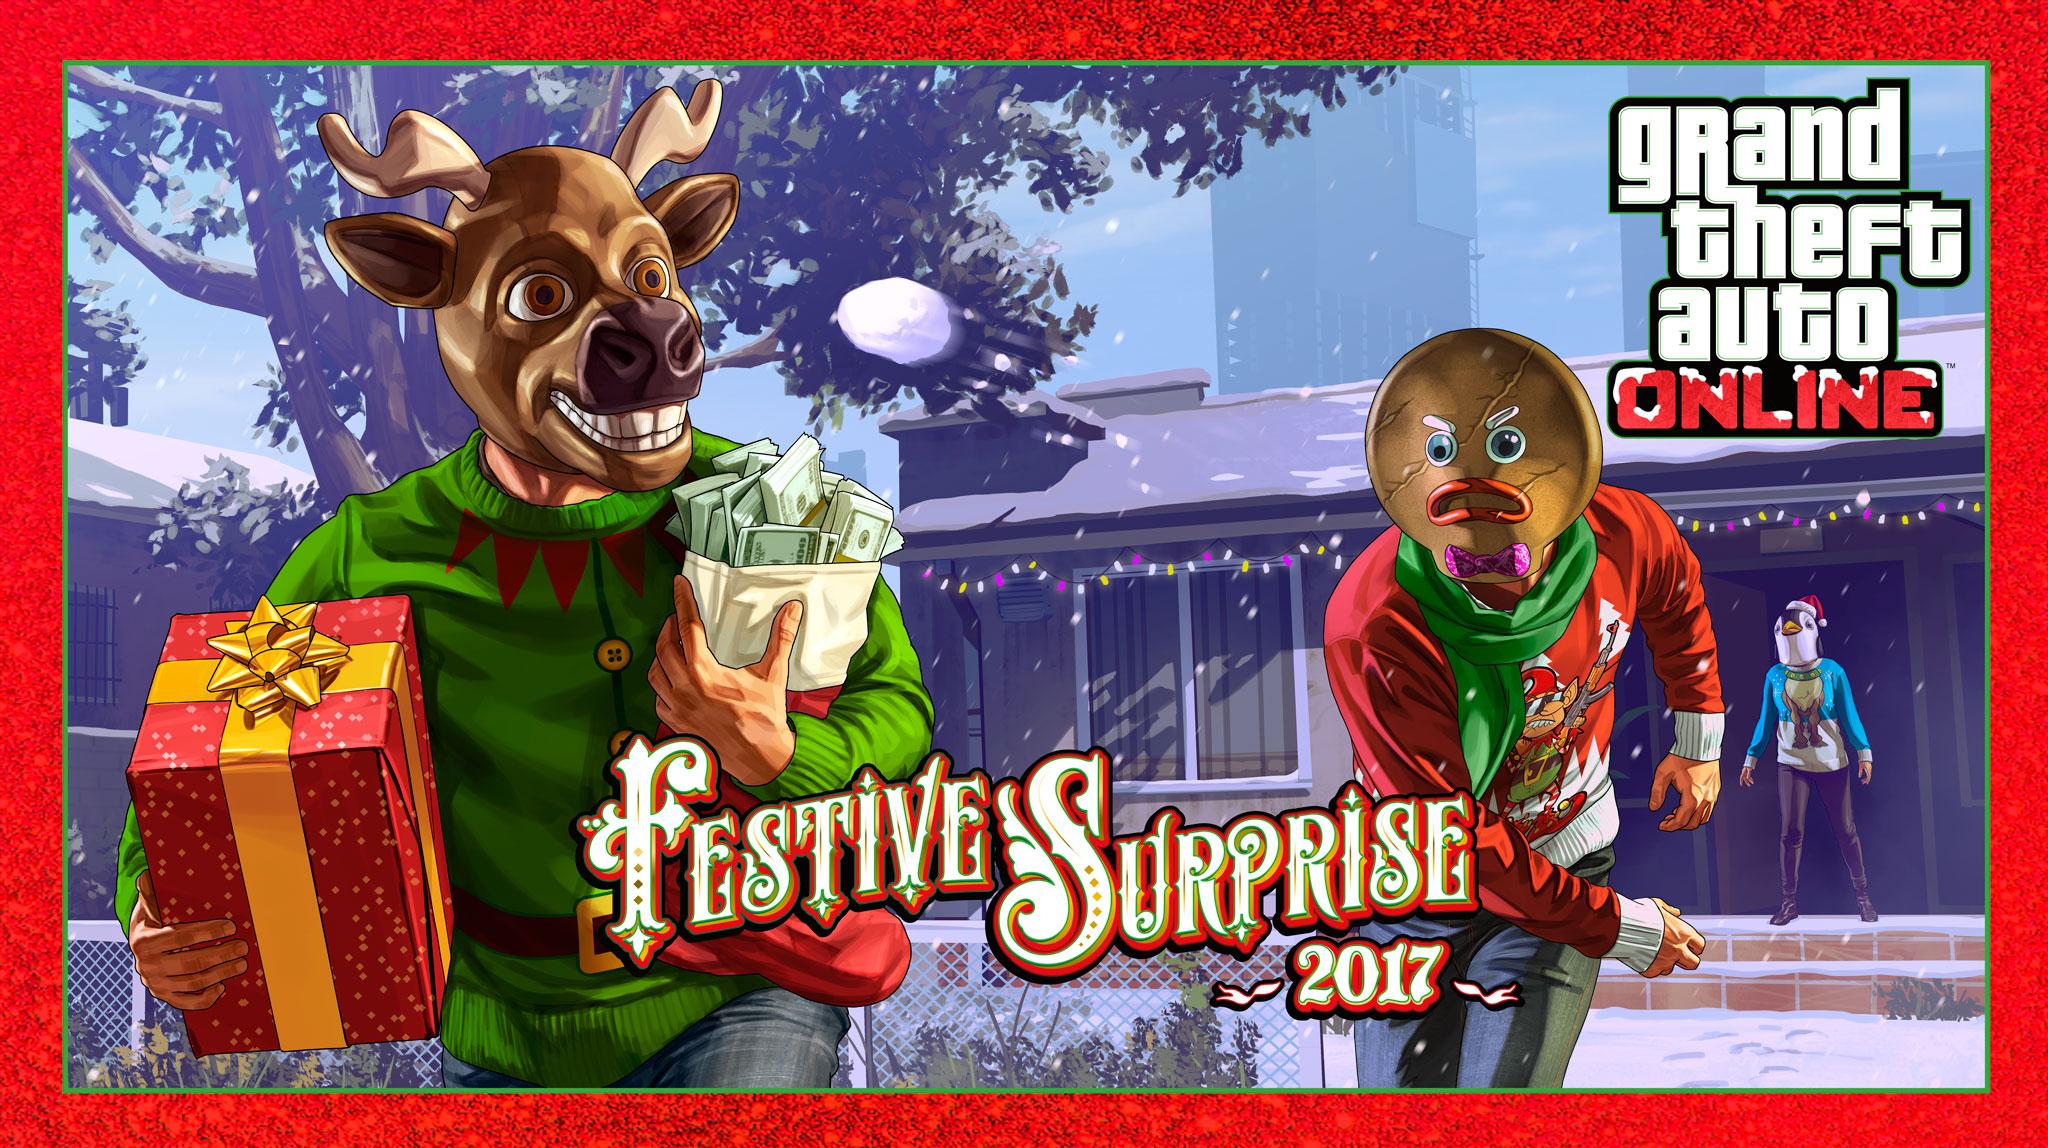 GTA 5 Online Festive Surprise 2017